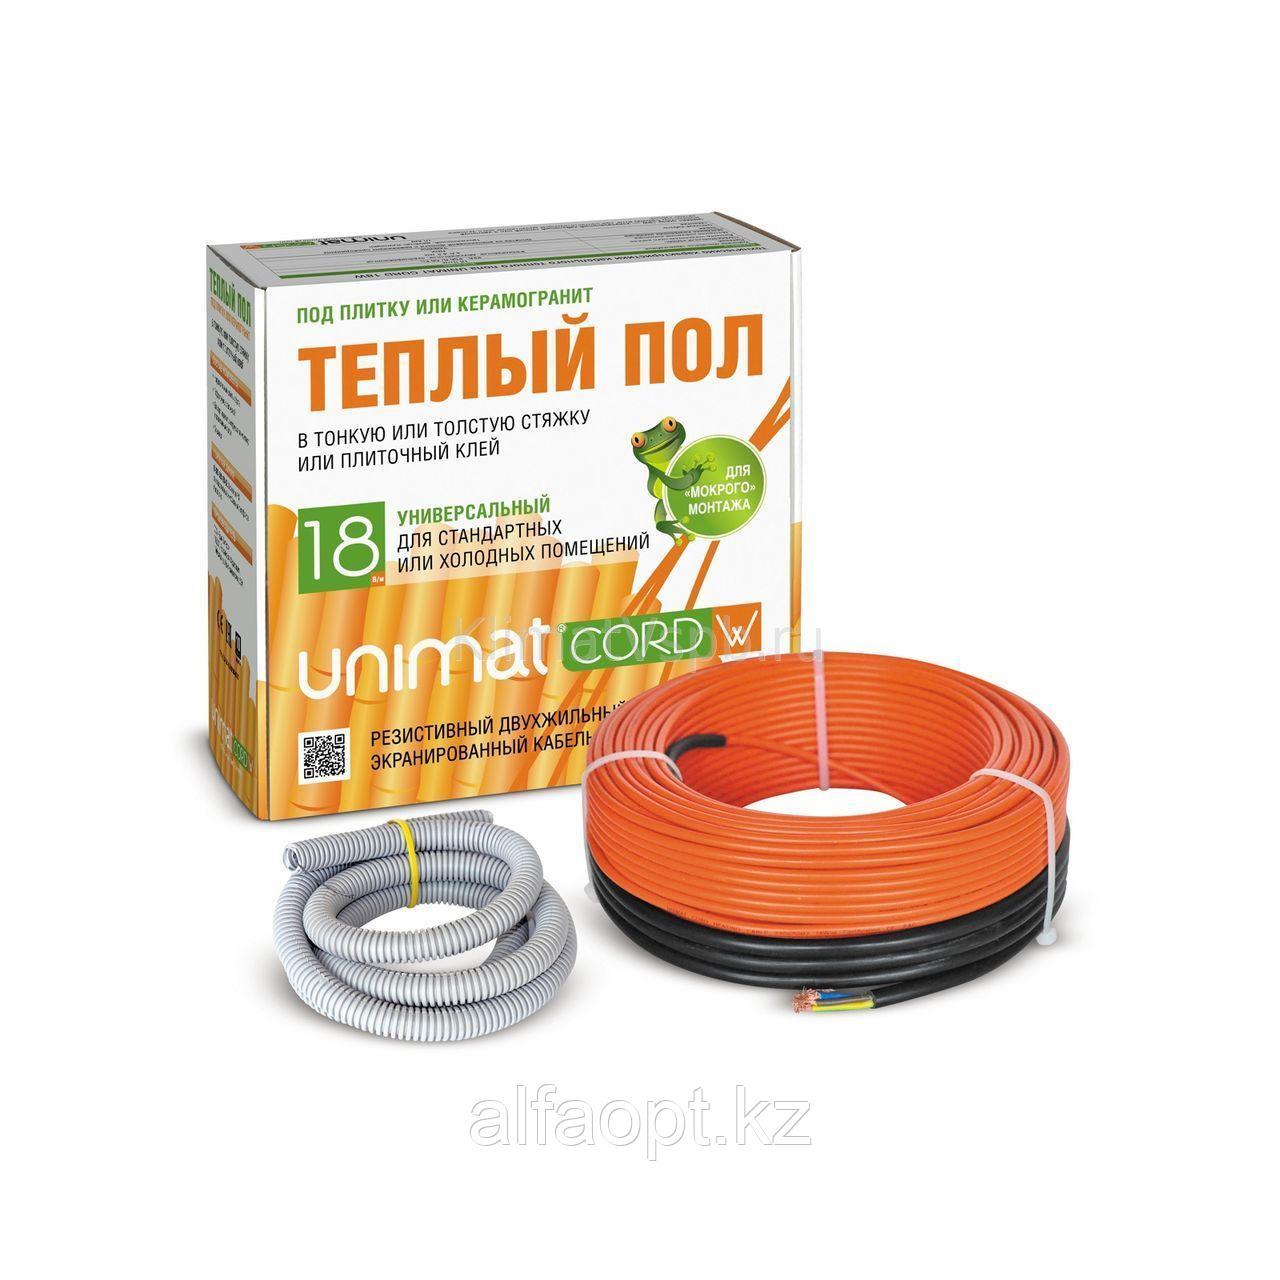 Комплект теплого пола Unimat CORD 18W-60